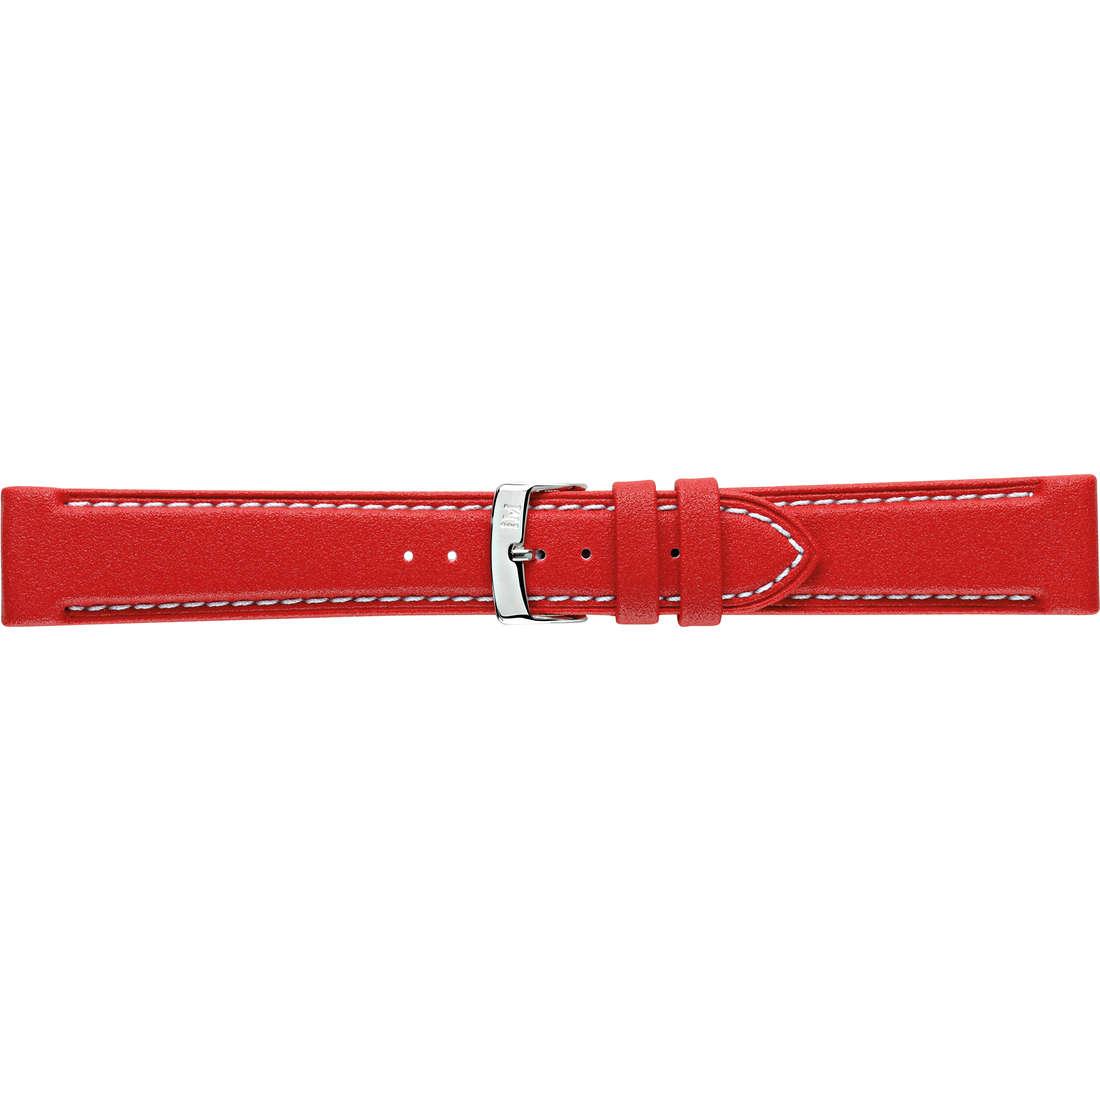 watch watch bands watch straps man Morellato Linea Sport A01U3822A42083CR20